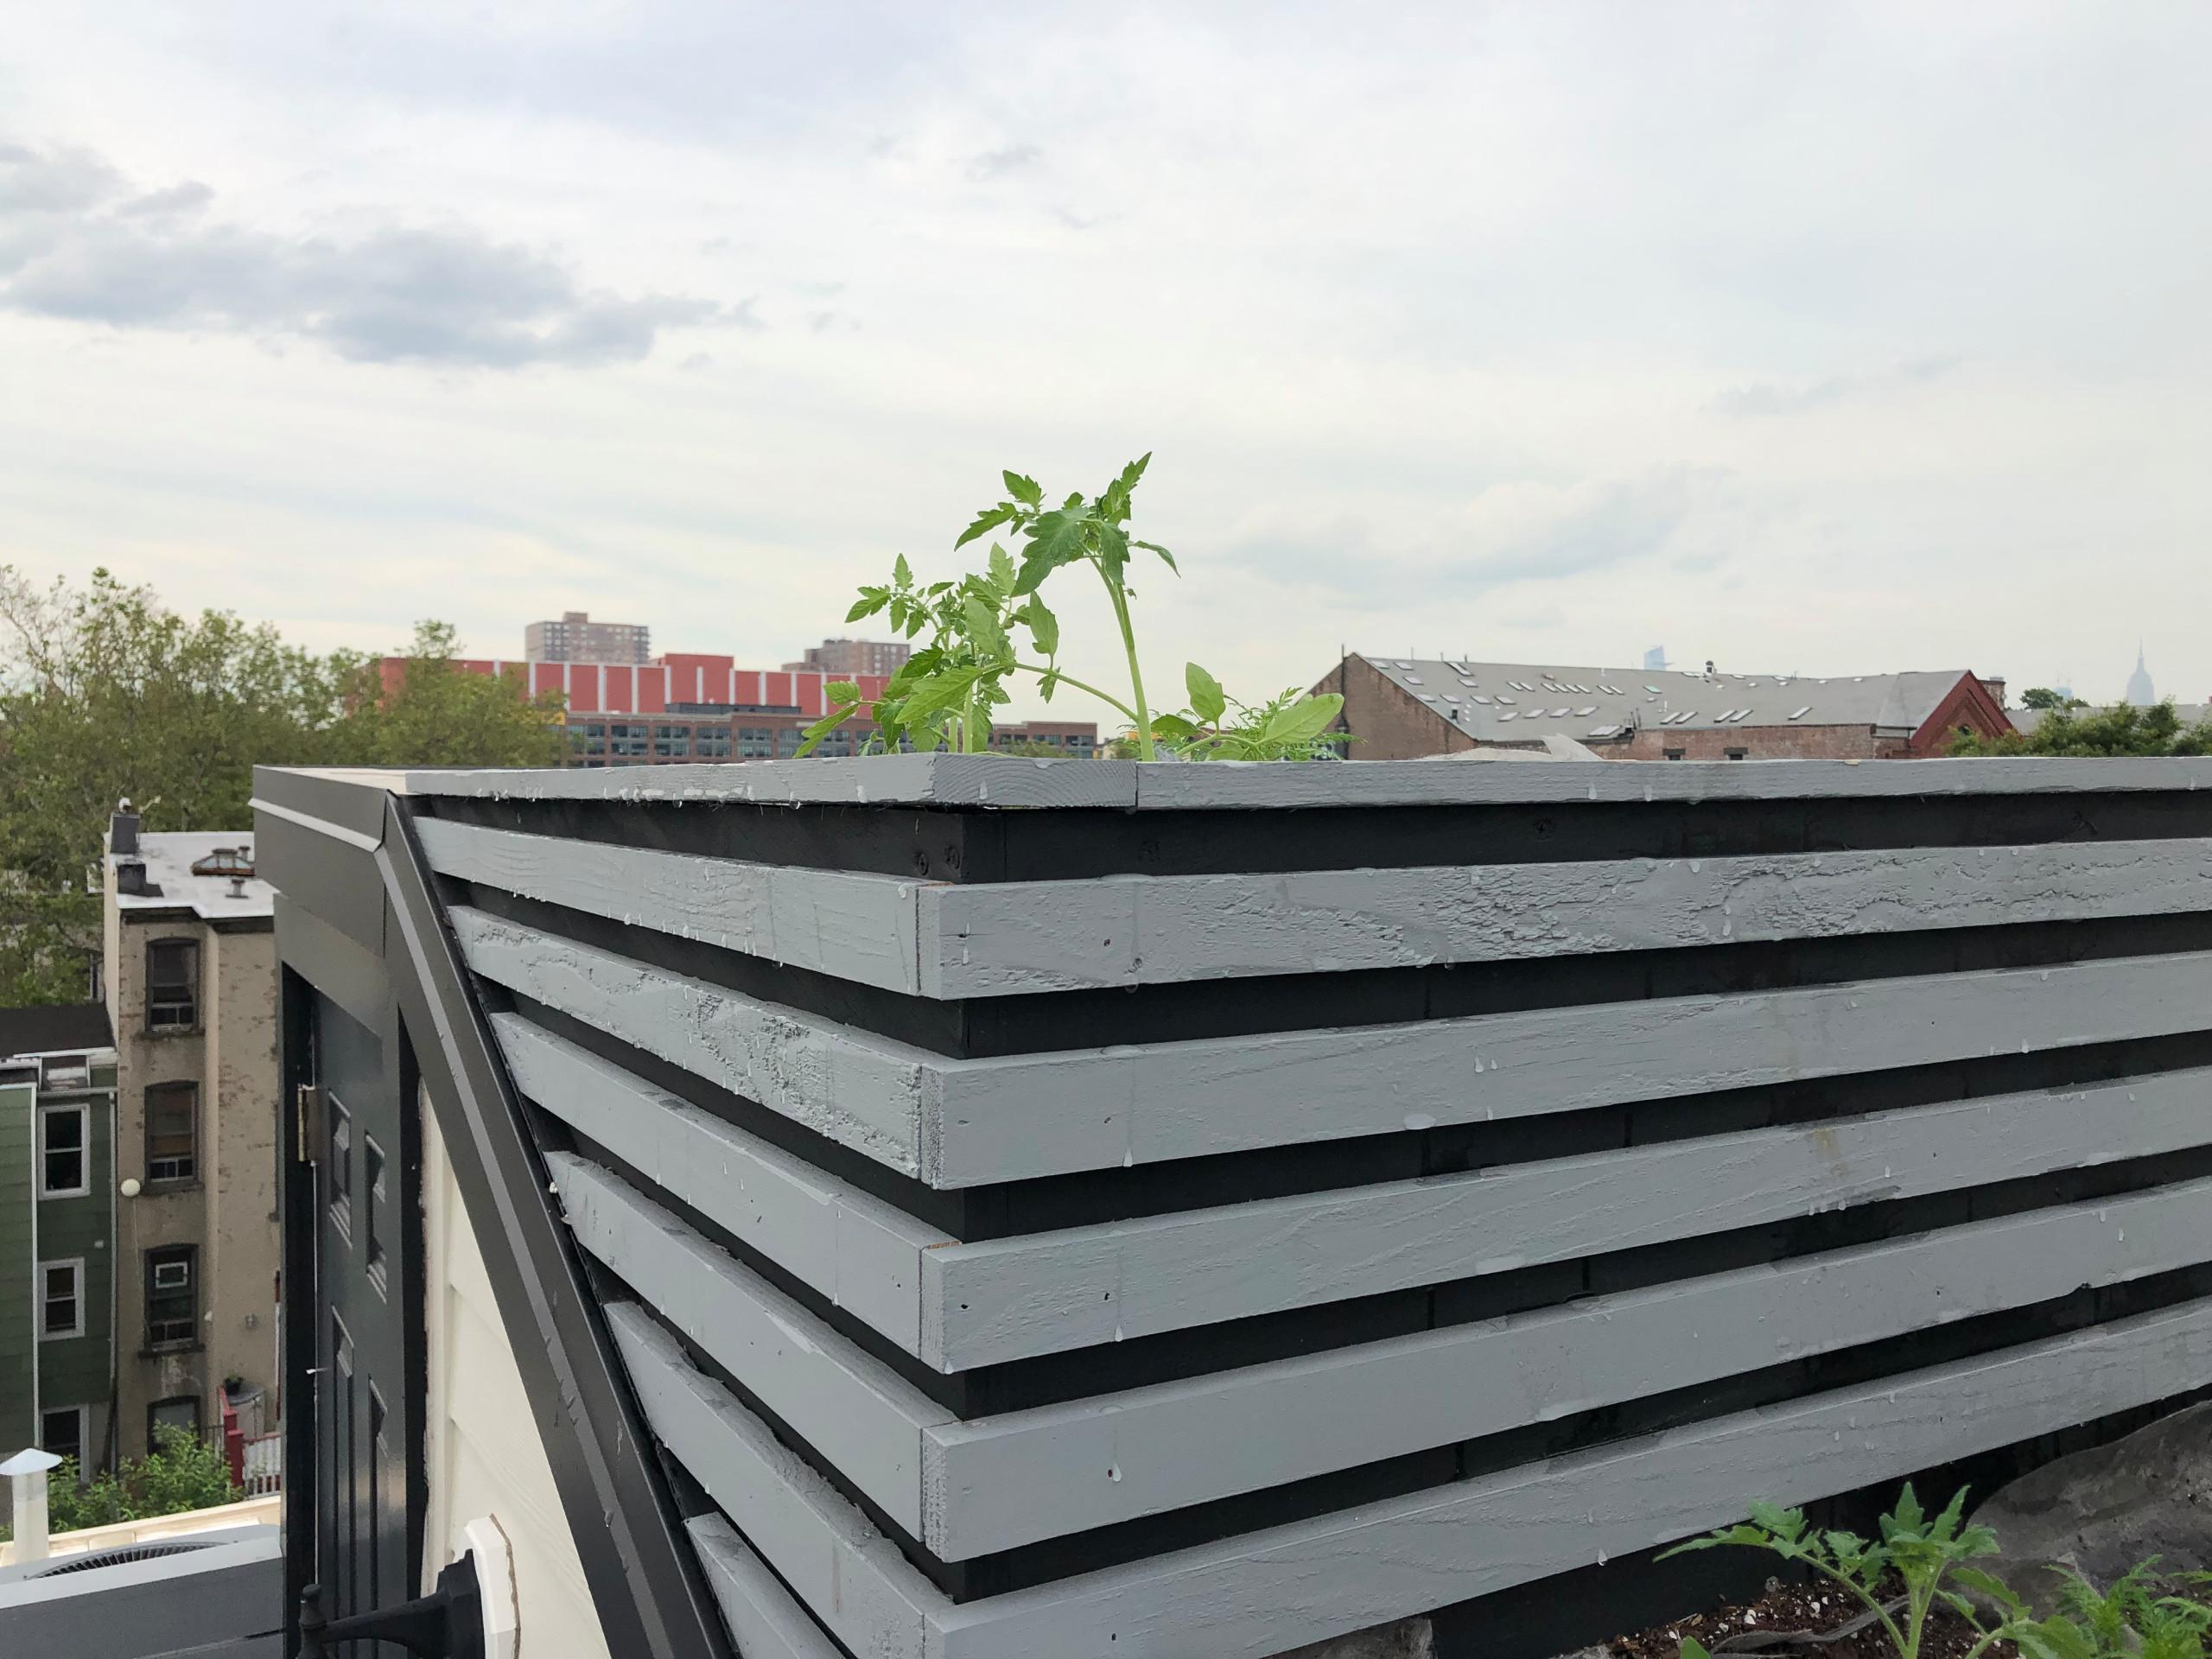 Grow your veggies